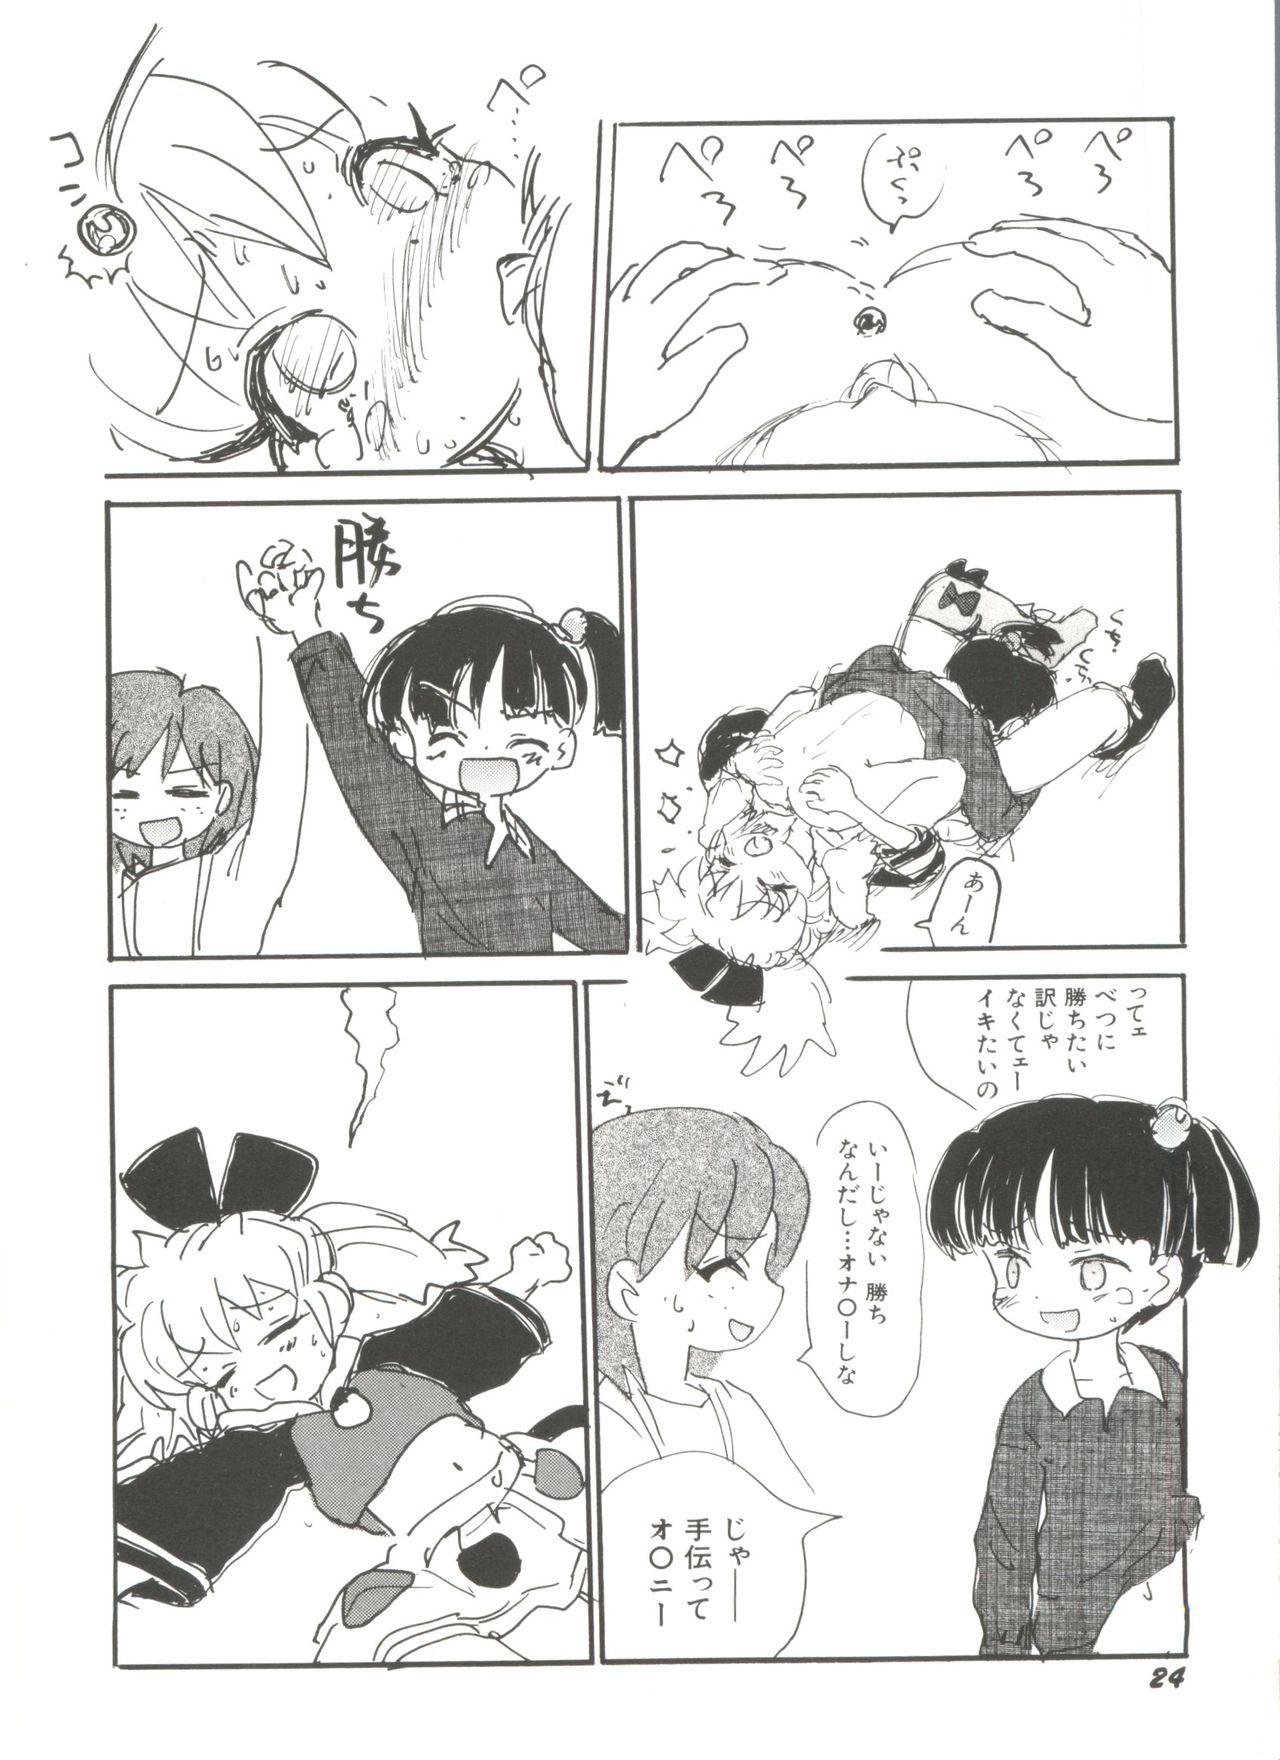 [Anthology] Denei Tamatebako 8 - Utakata no Tenshi-tachi II (Various) 25